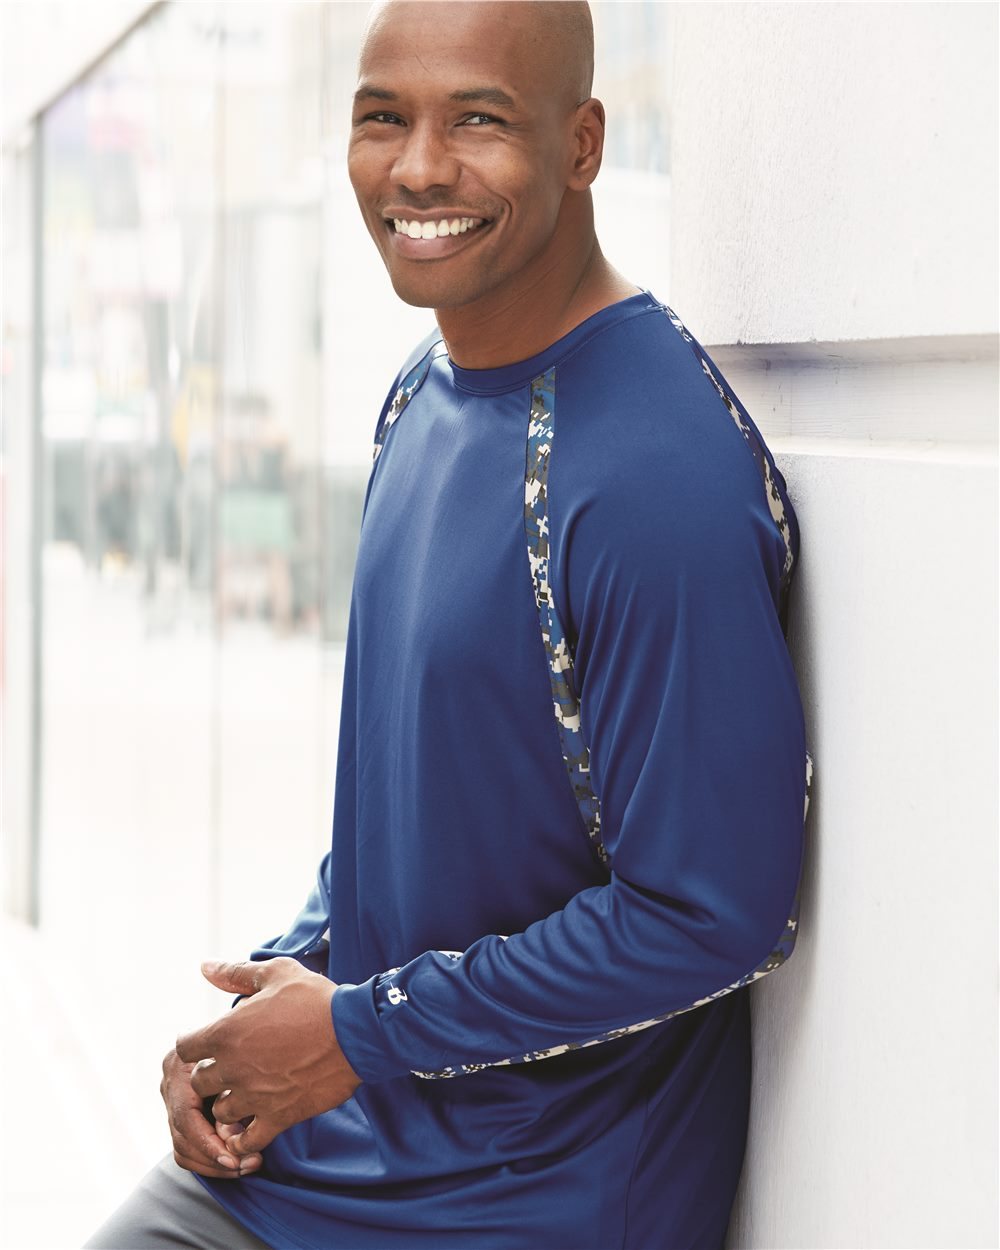 Badger 4155 - Digital Camo Hook Long Sleeve Tee Shirt